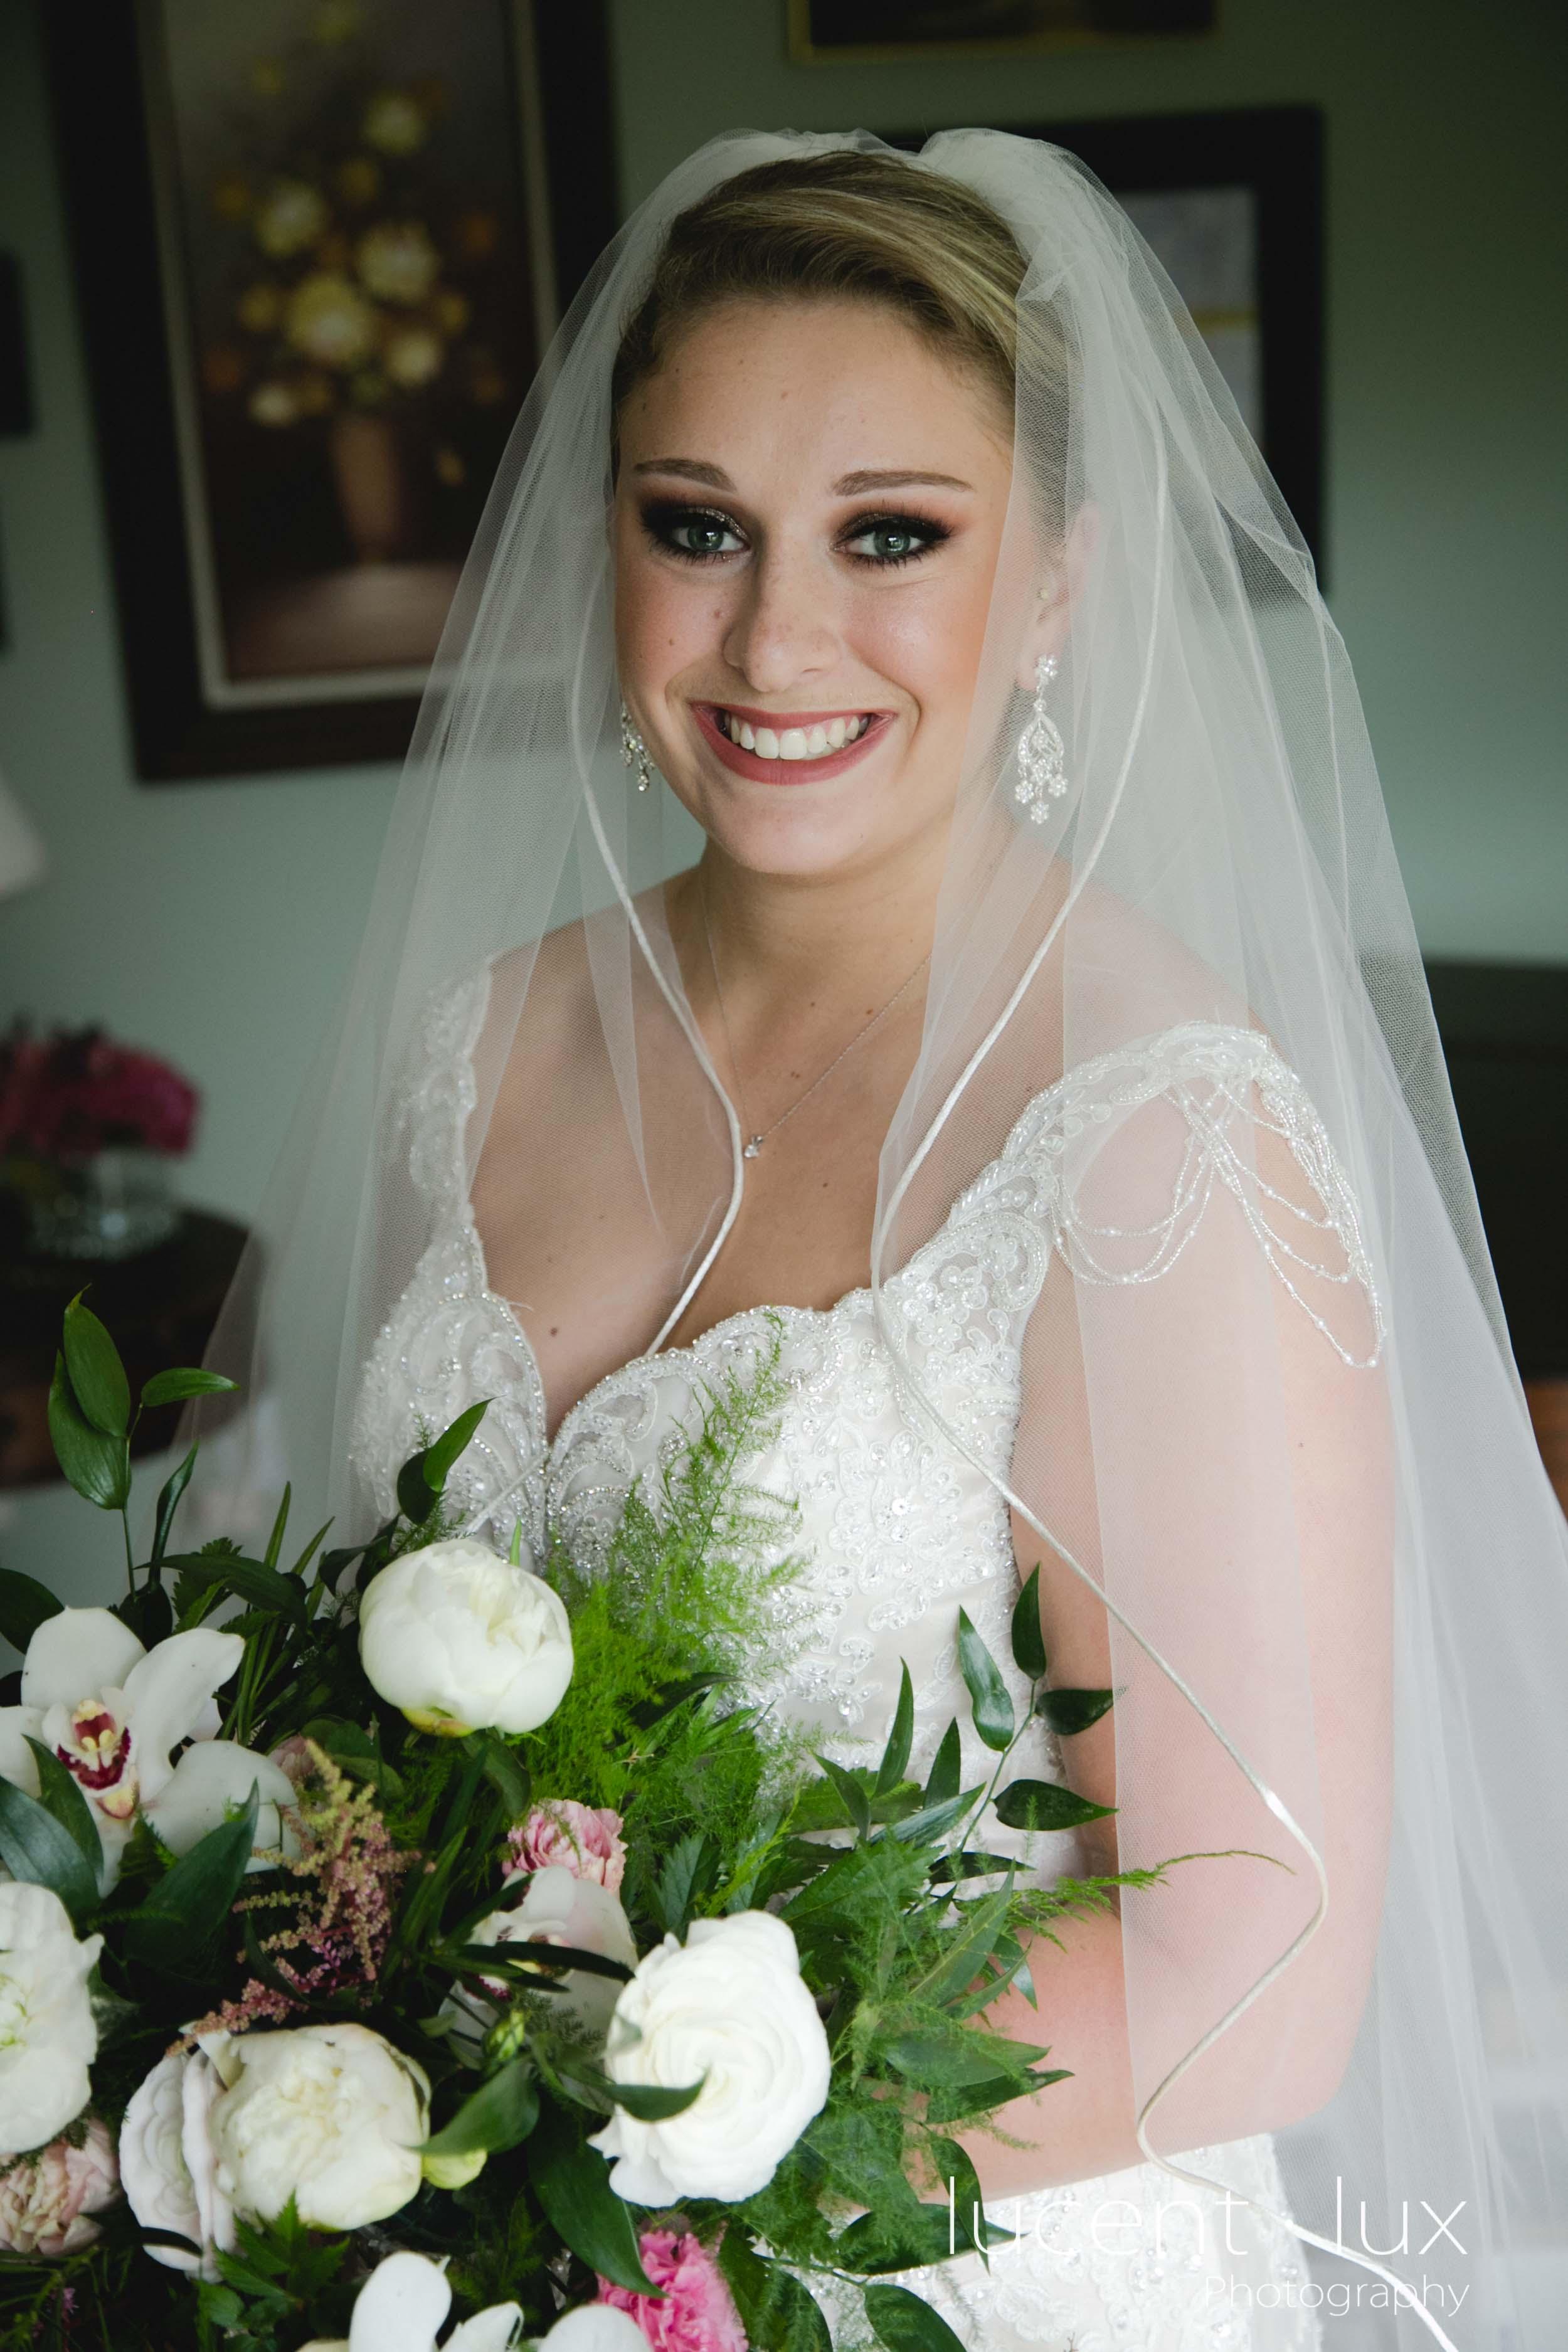 Wedding-Photography-Maryland-Pennsylvania-Photographer-Mendenhall-Inn-Media-Portrait-Event-112.jpg